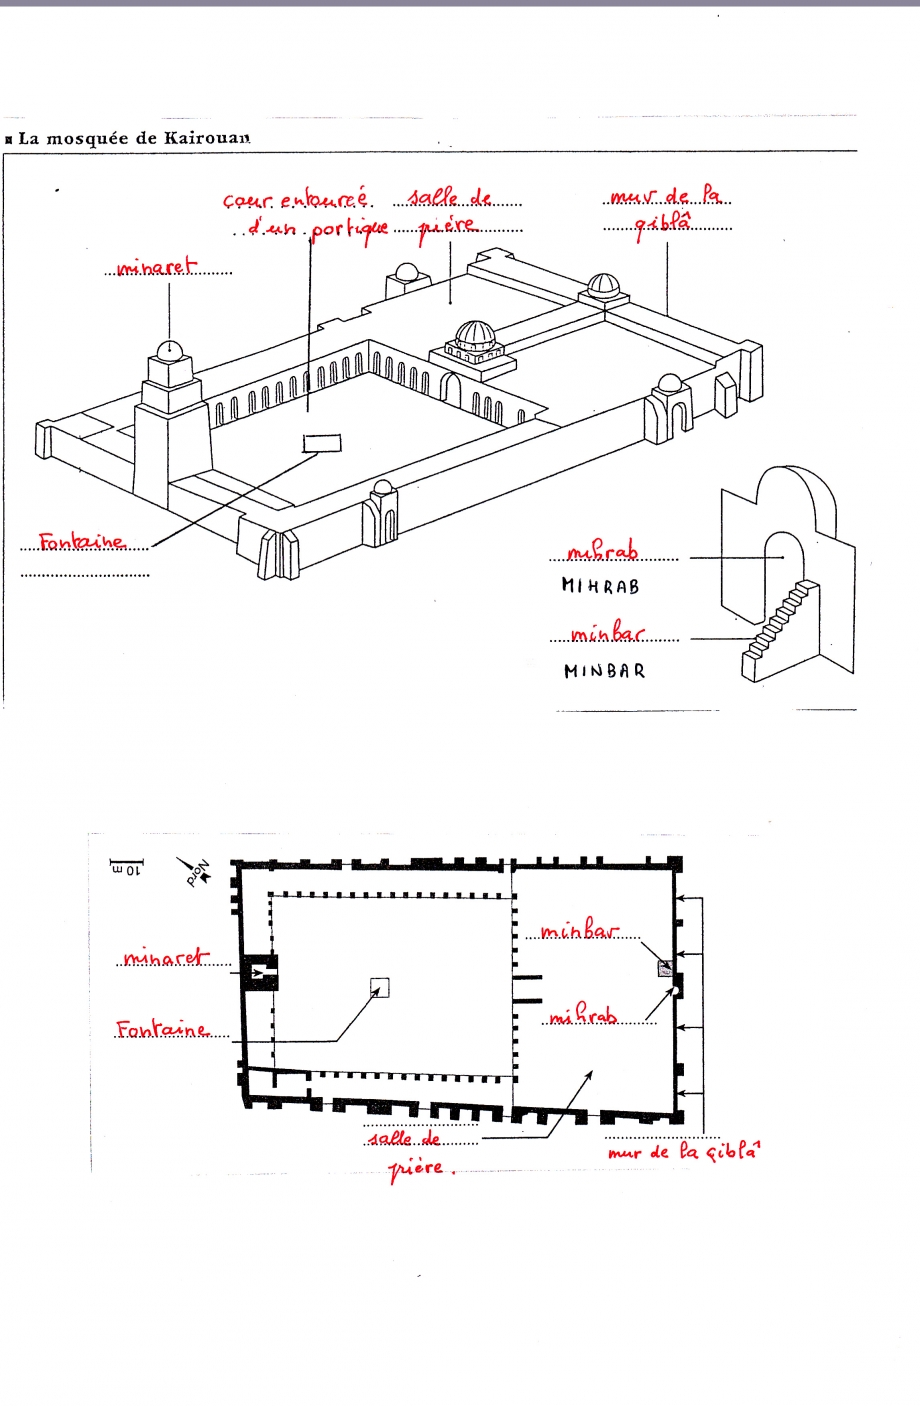 Mosquée Schéma corrigé.jpg